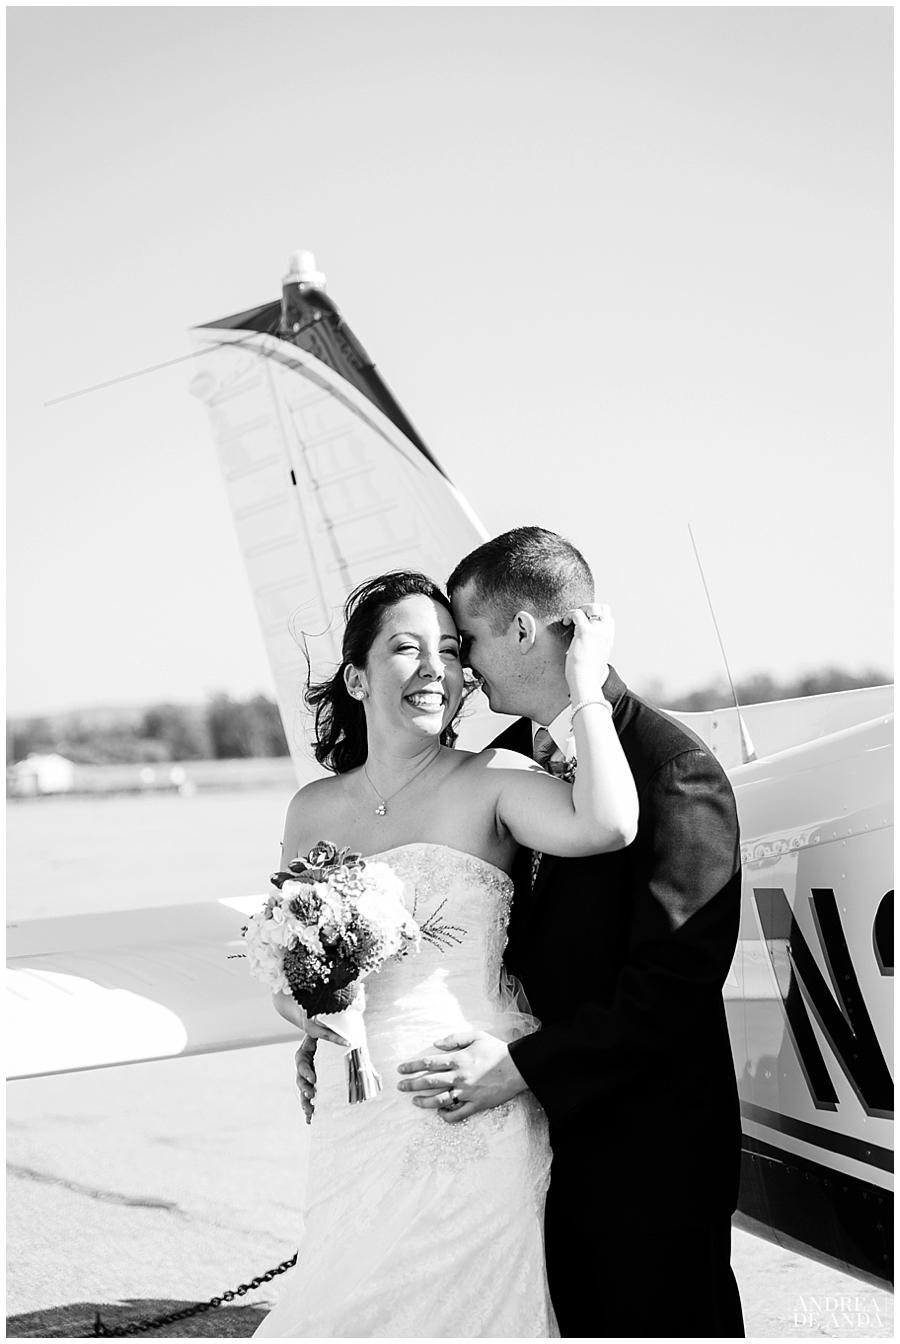 Radisson_Central Coast Wedding Photography-61.jpg